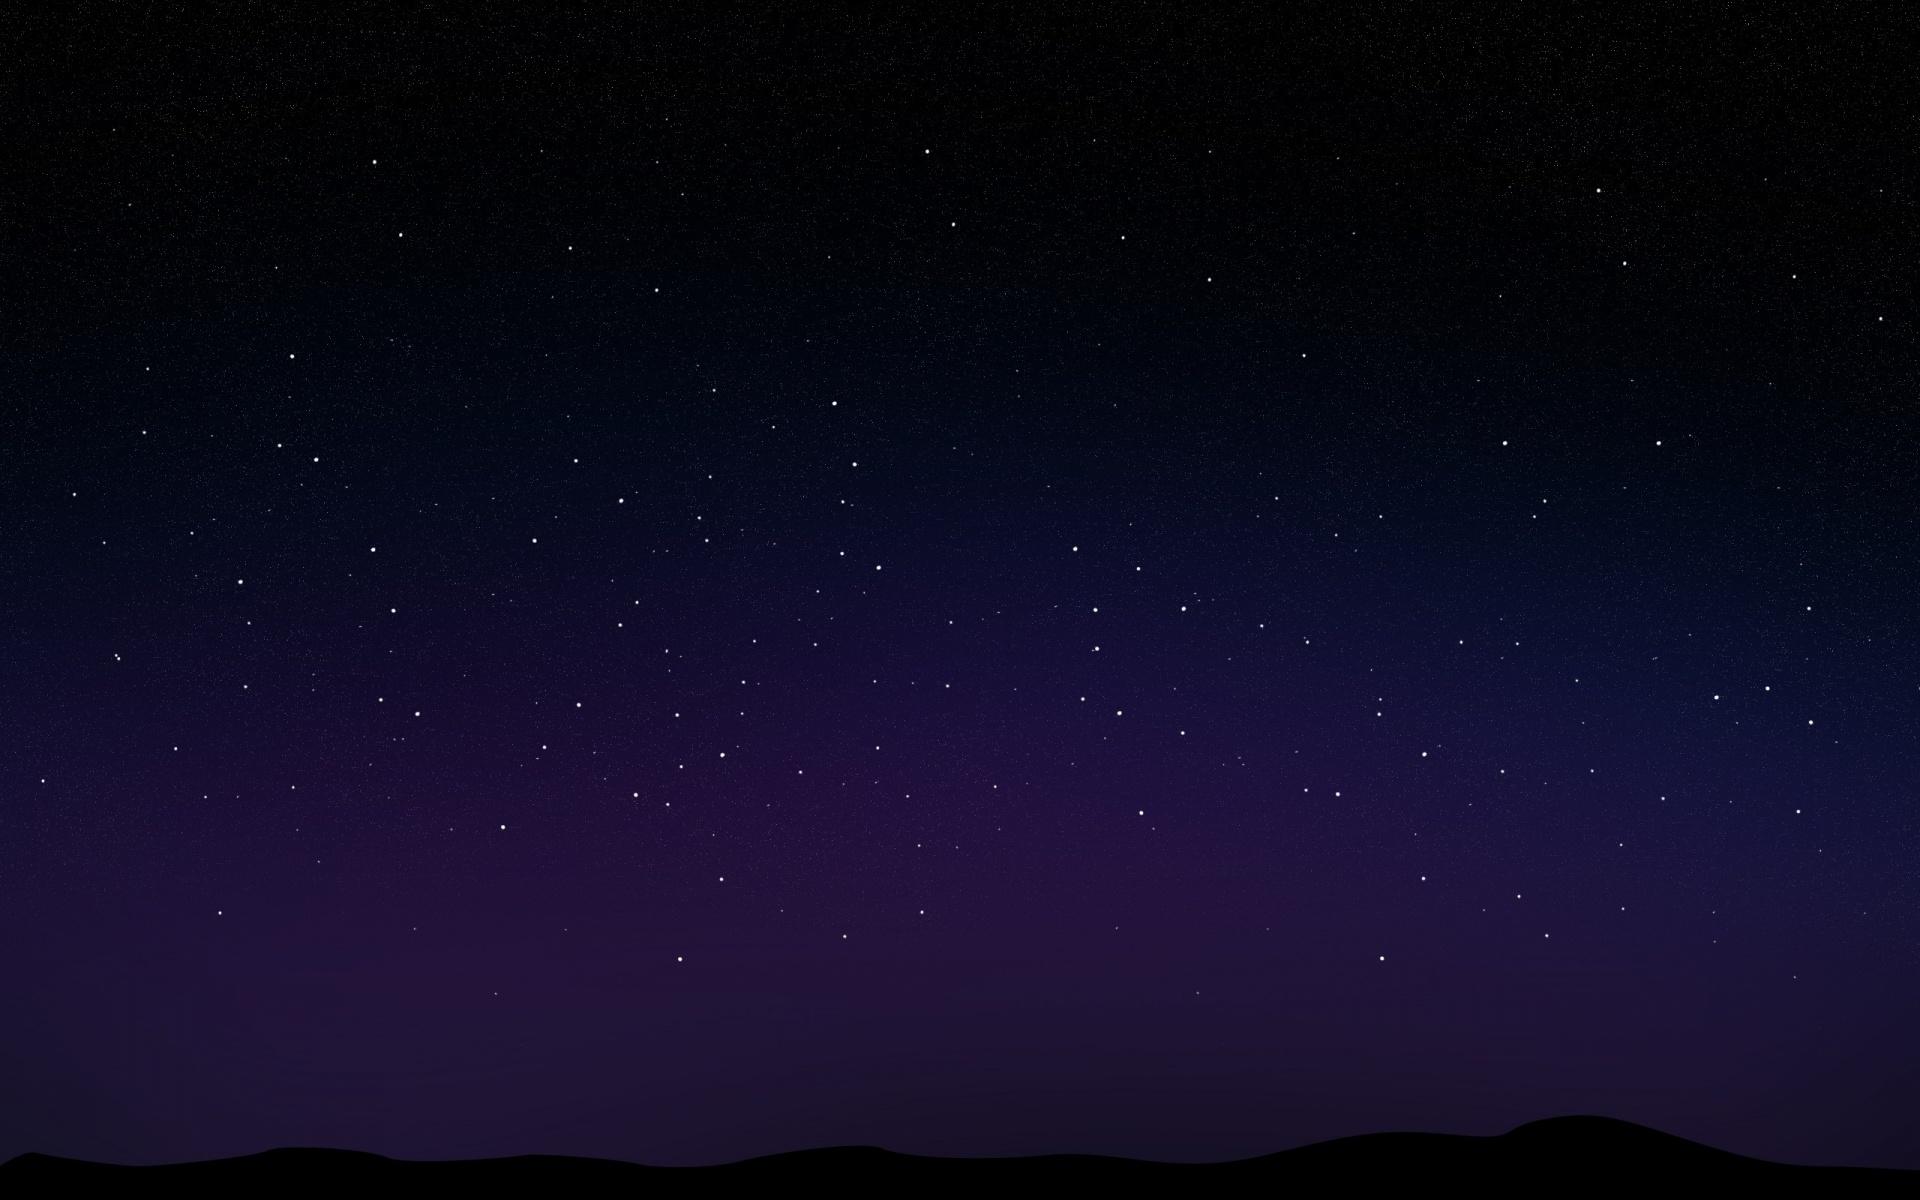 Dark Night Sky Images amp Pictures   Becuo 1920x1200